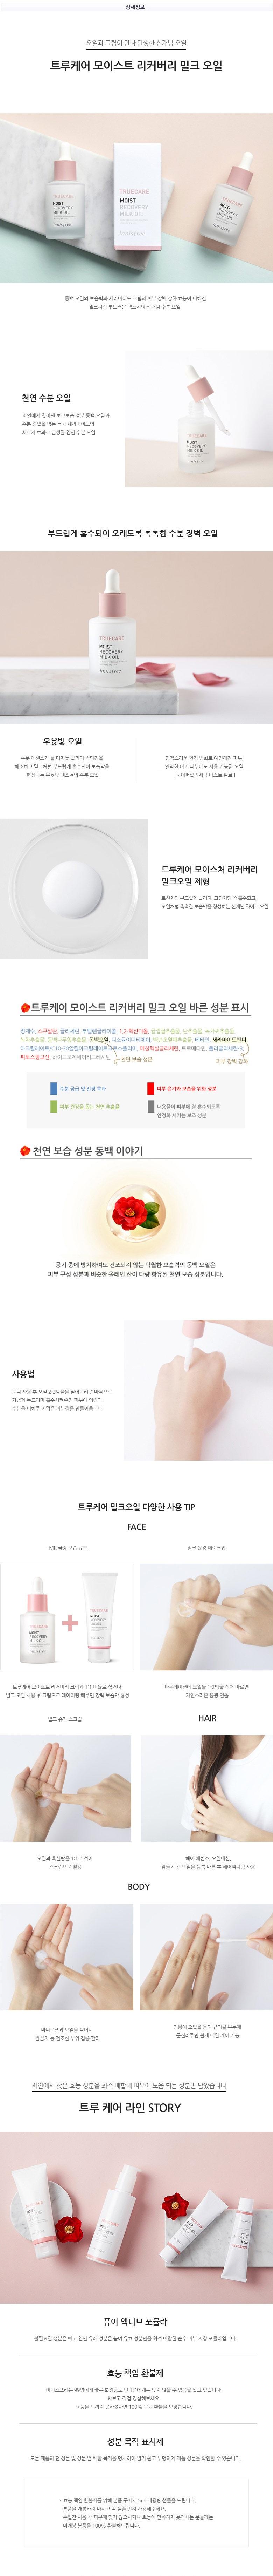 Innisfree Truecare Moist Recovery Milk Oil korean cosmetic skincare product online shop malaysia macau china1